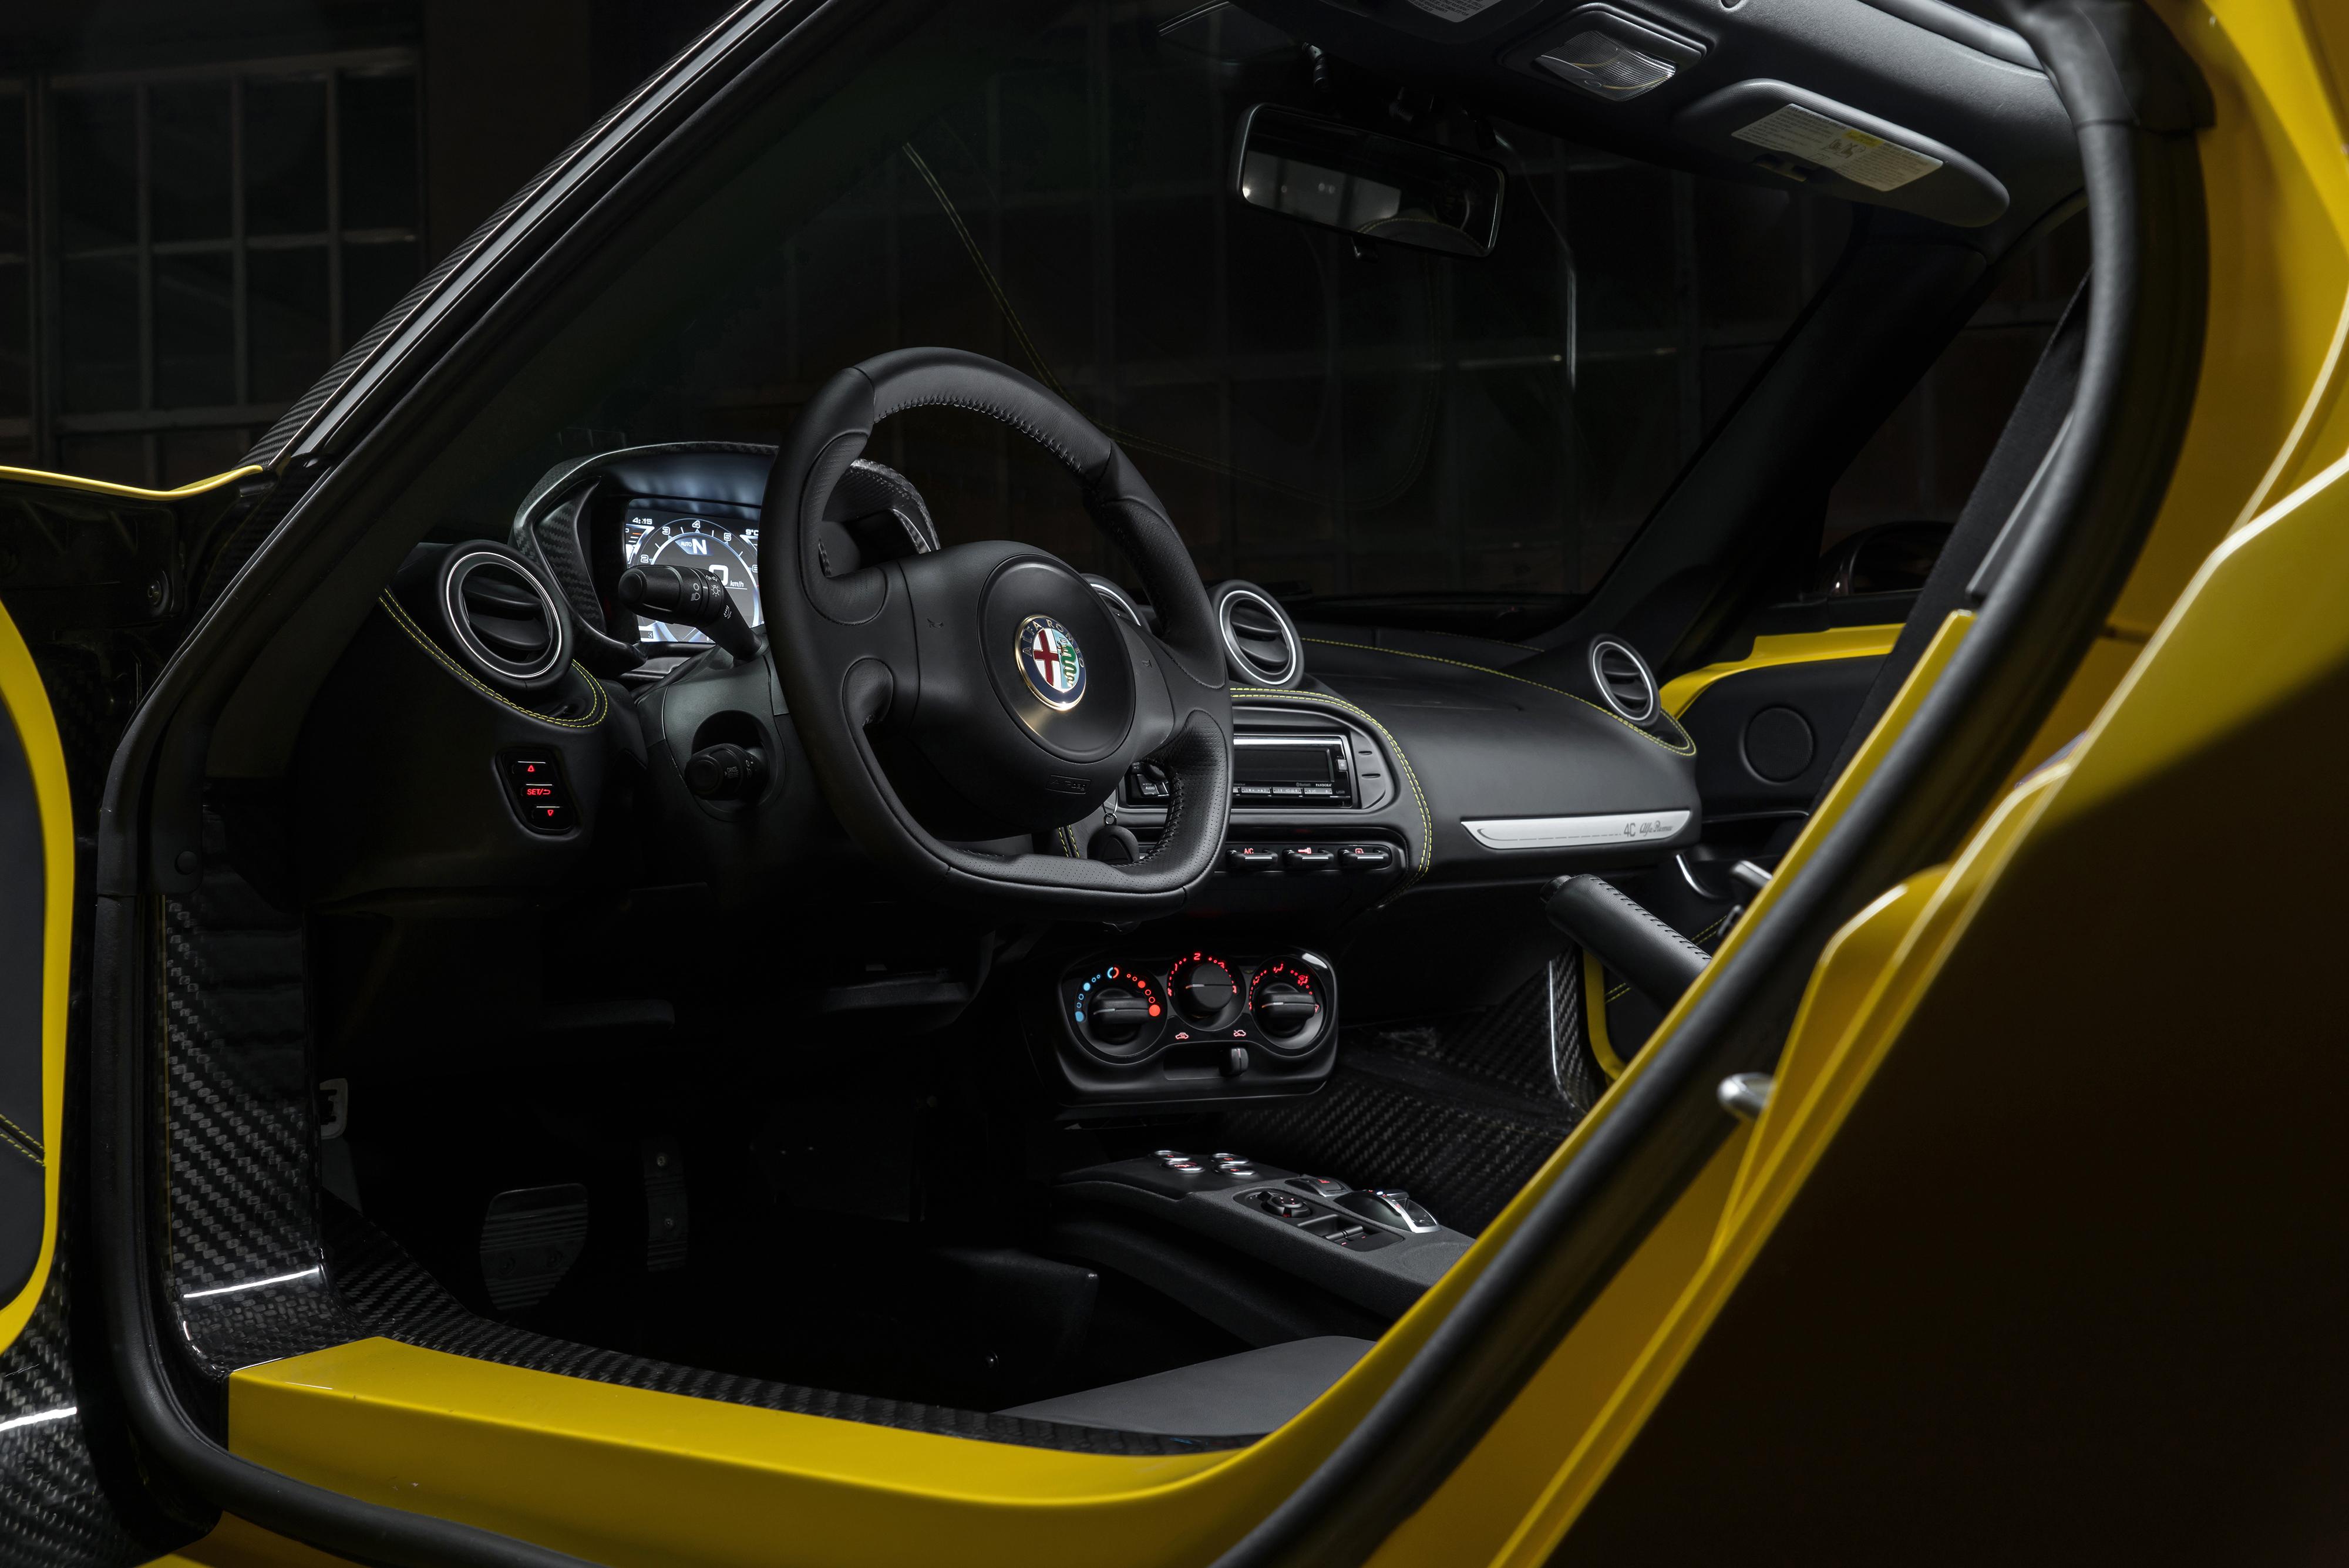 Wallpaper Sports Car Alfa Romeo Steering Wheel Netcarshow Vehicle Netcar Images Photo 2017 4c